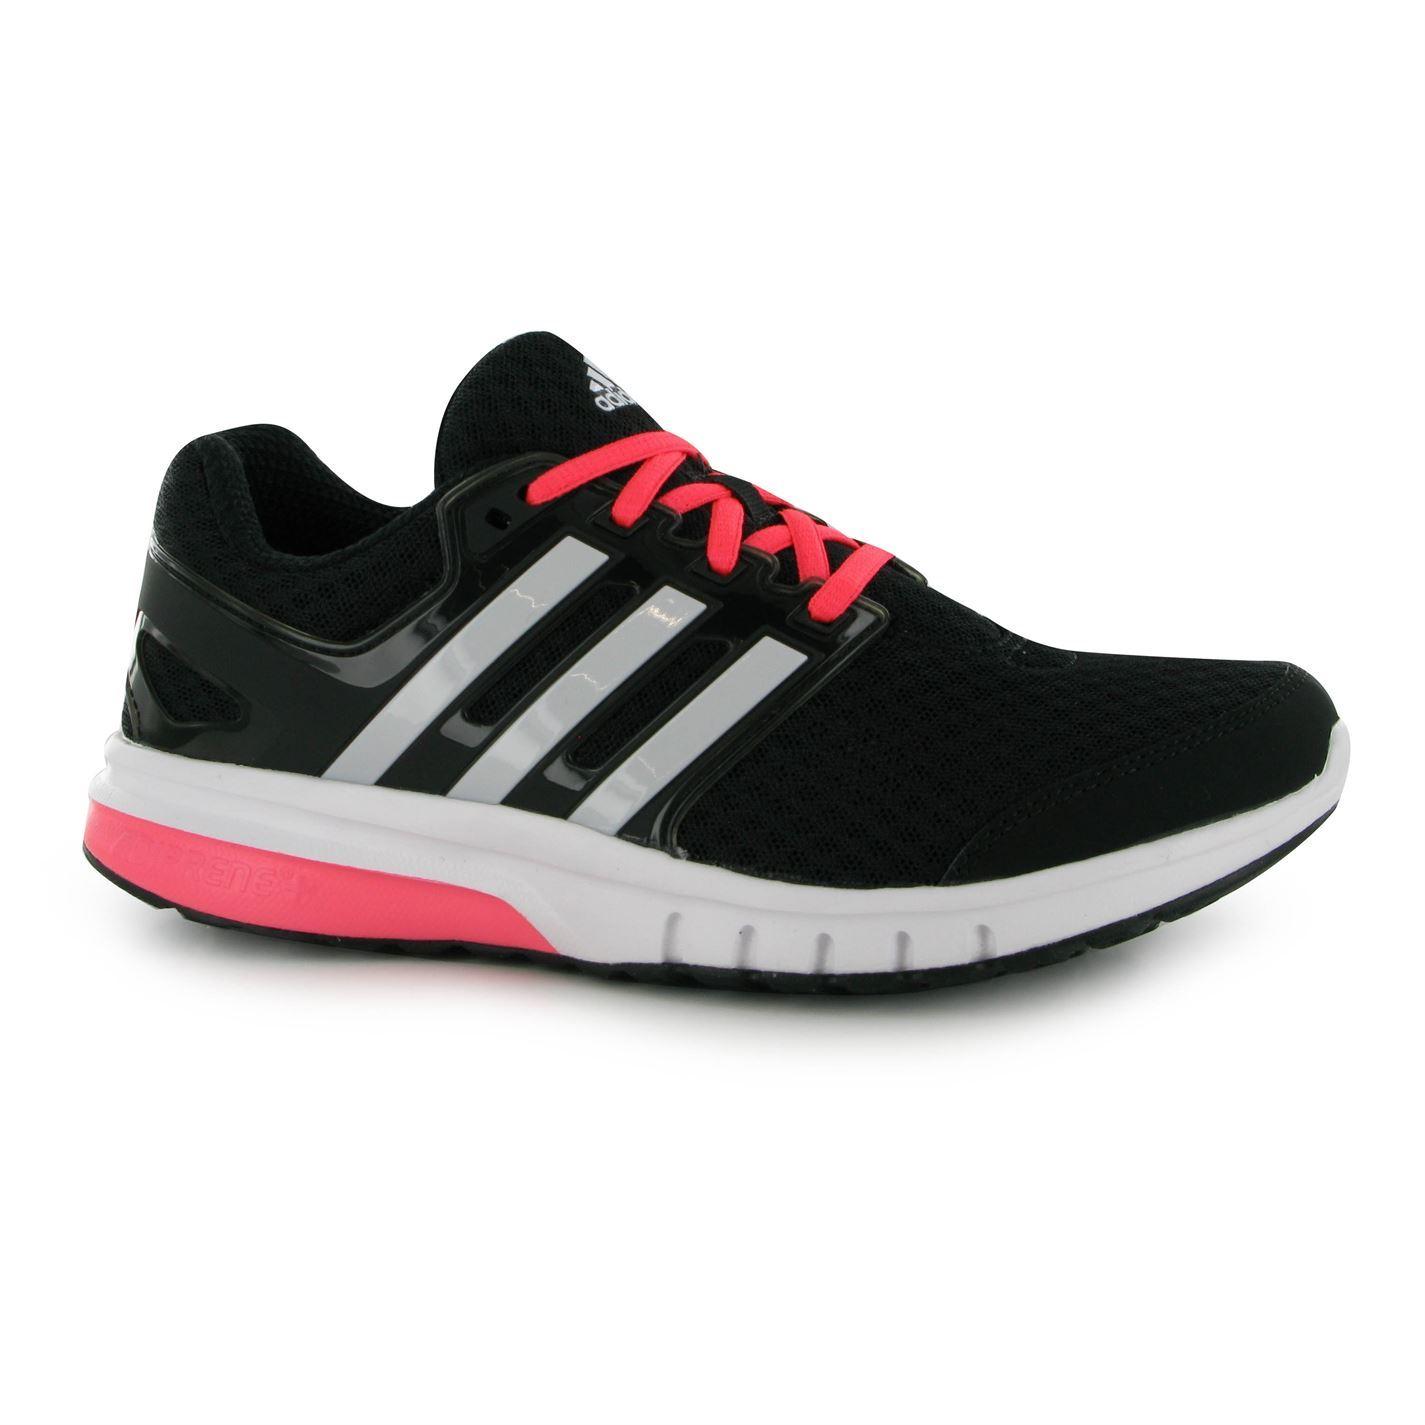 adidas galaxy elite running shoes